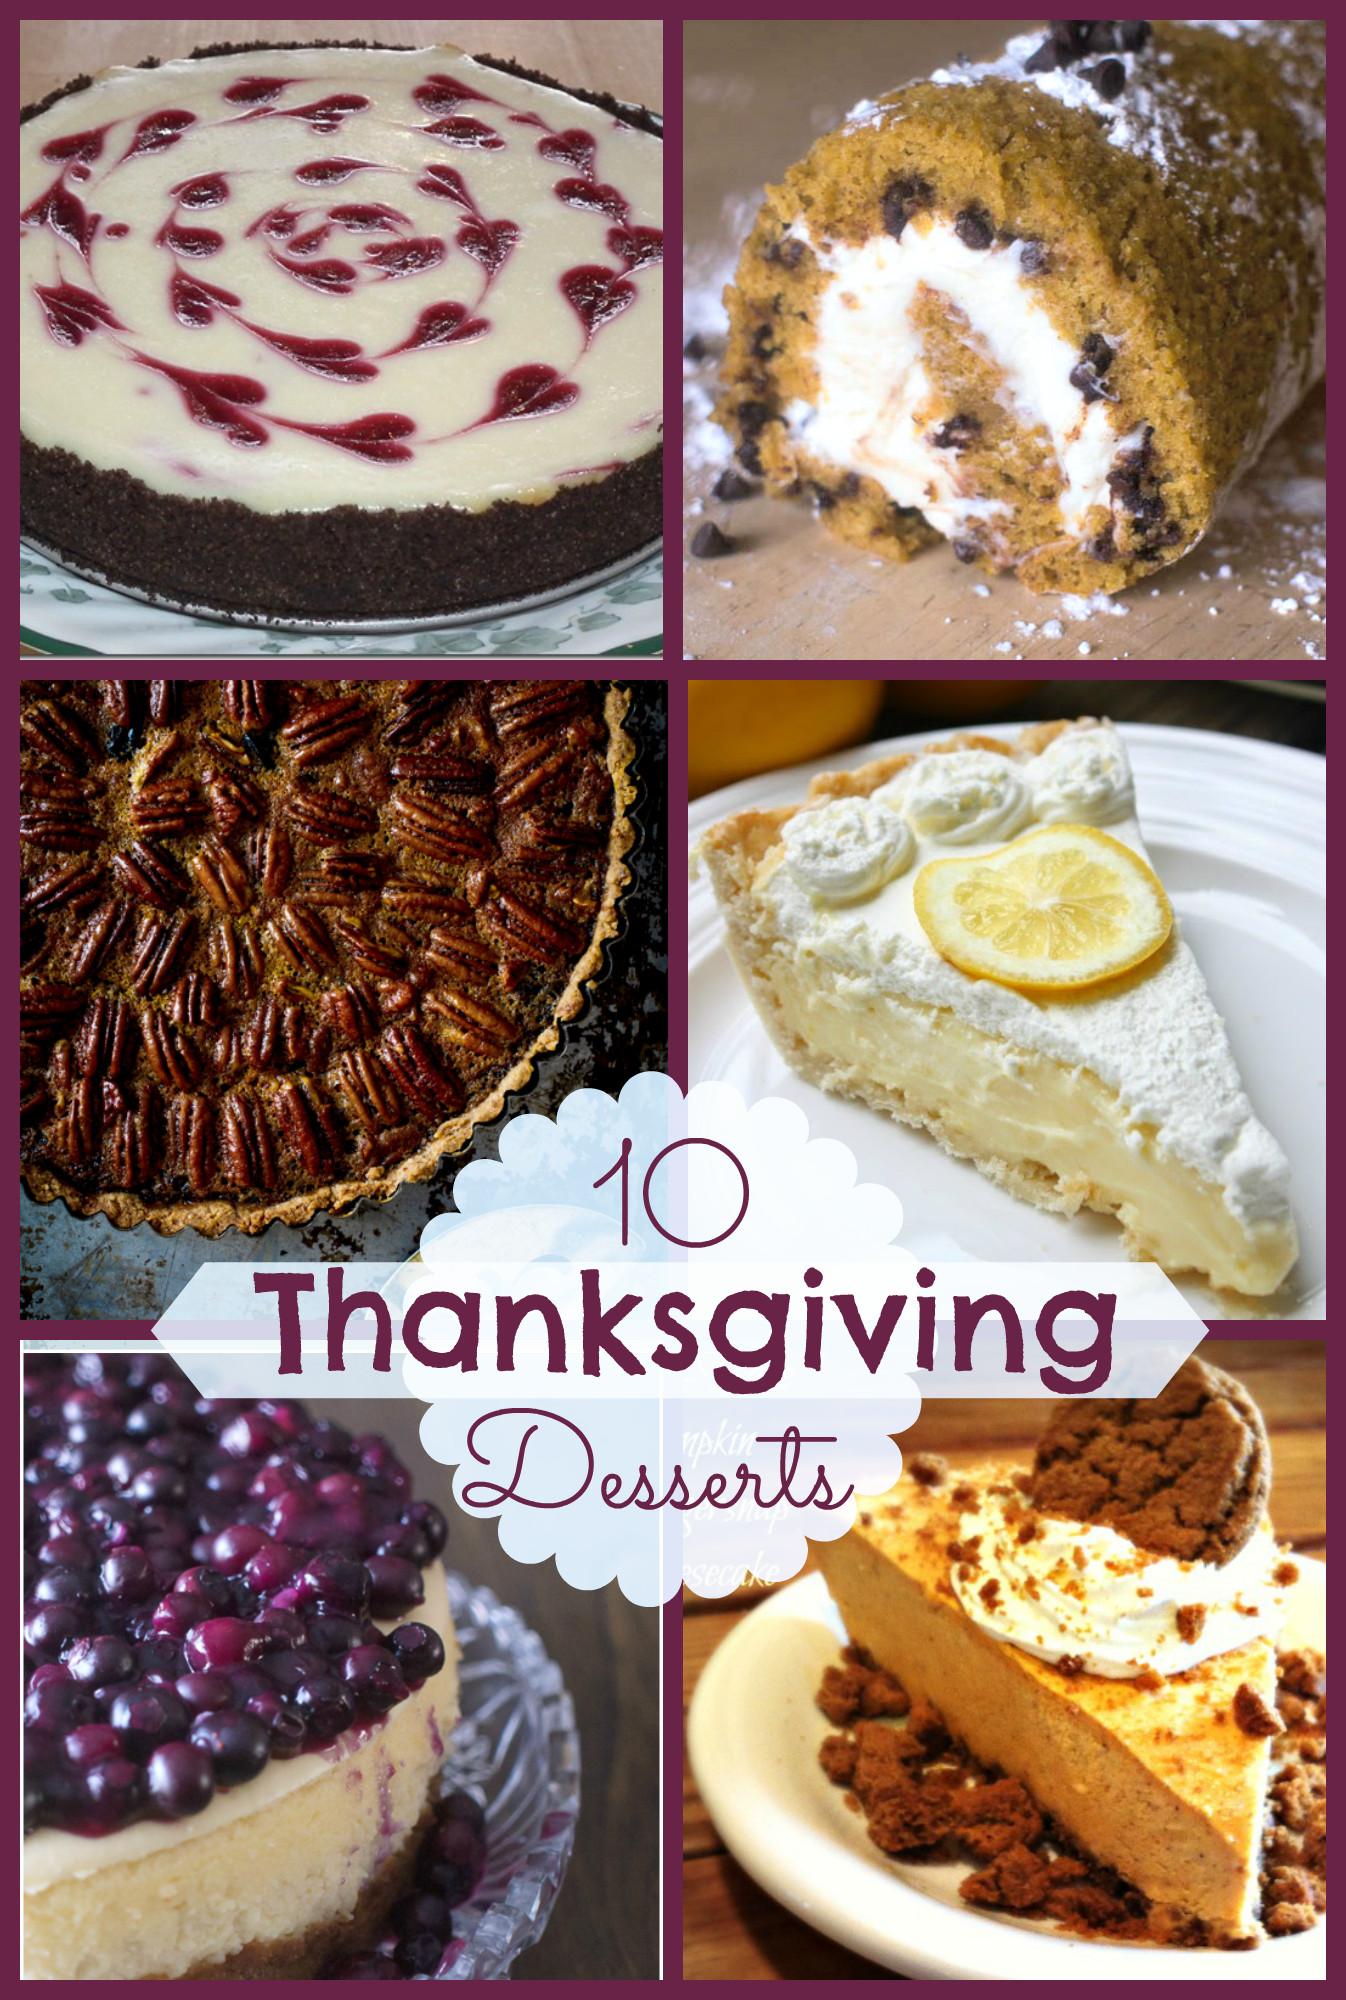 Desserts For Thanksgiving  10 Fabulous Thanksgiving Desserts